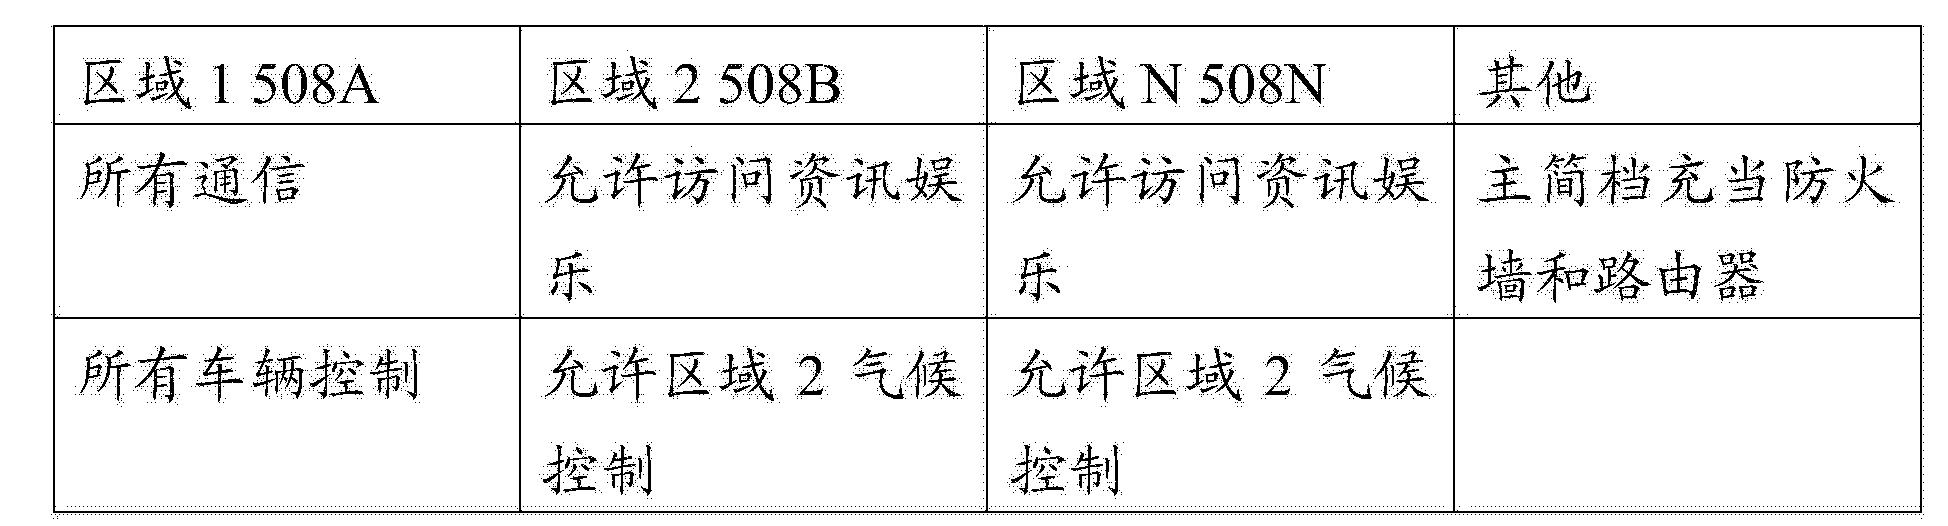 Figure CN104520676AD00322